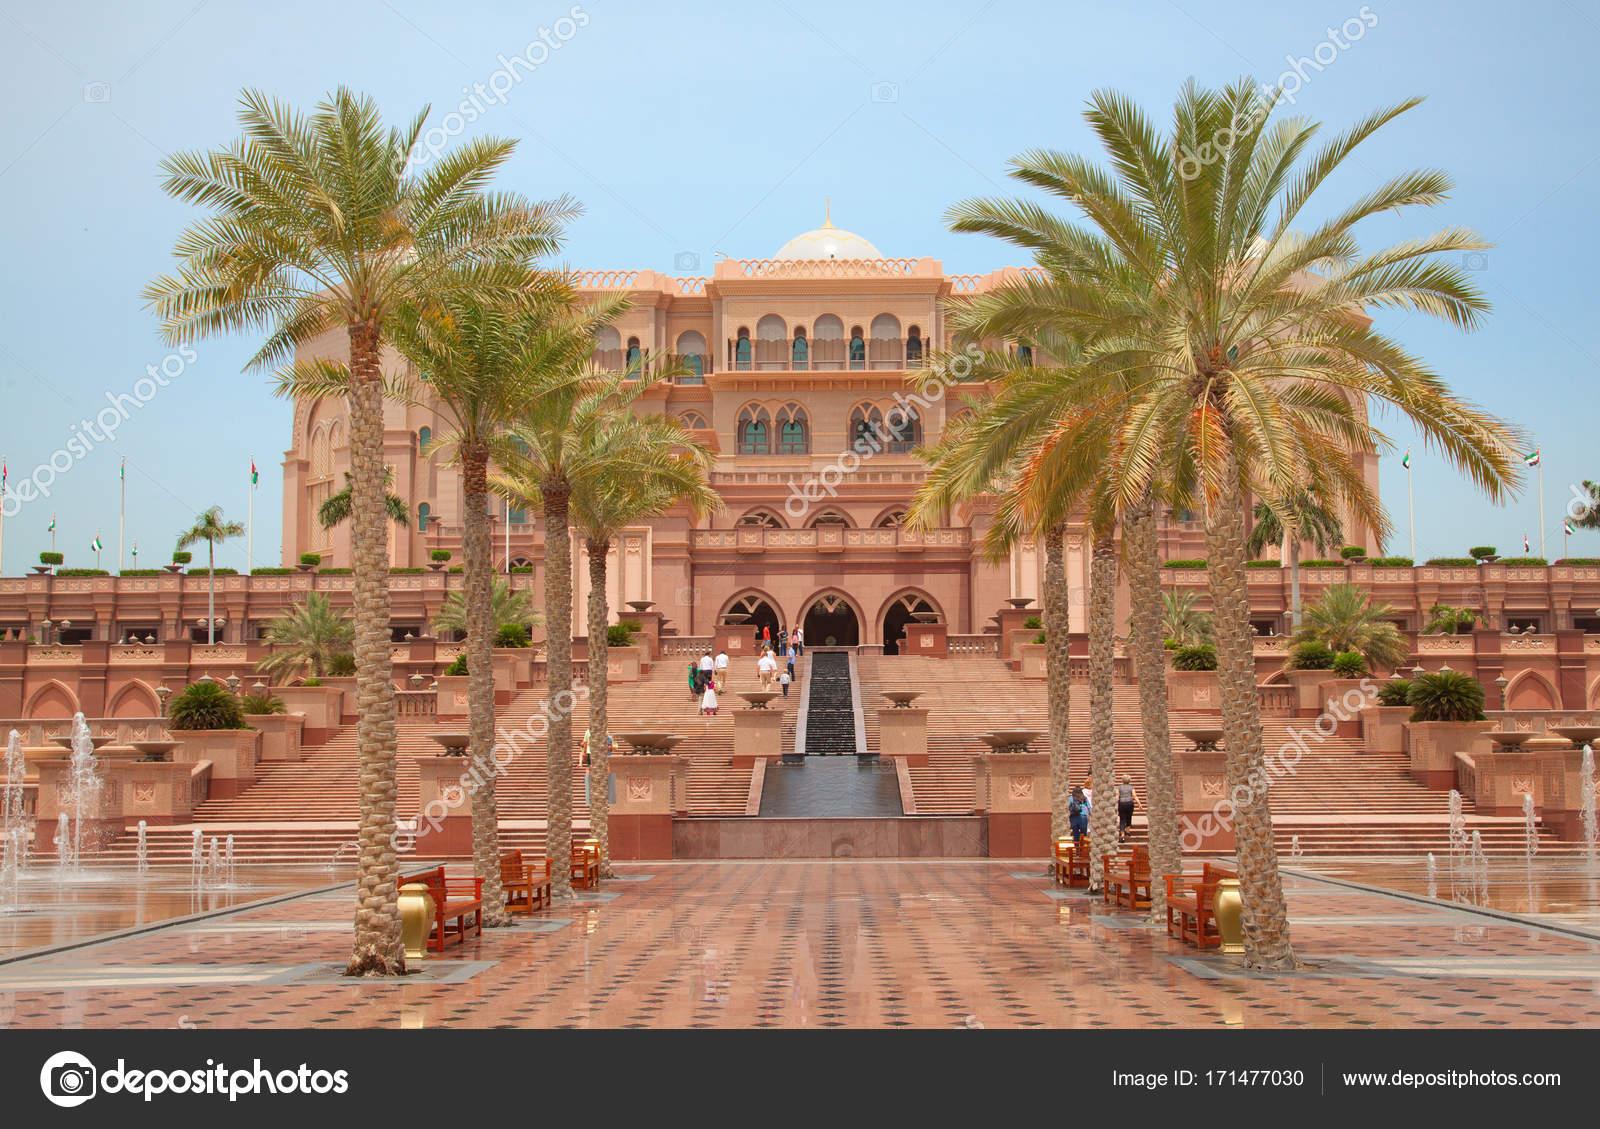 Das Emirates Palasthotel Redaktionelles Stockfoto Swisshippo